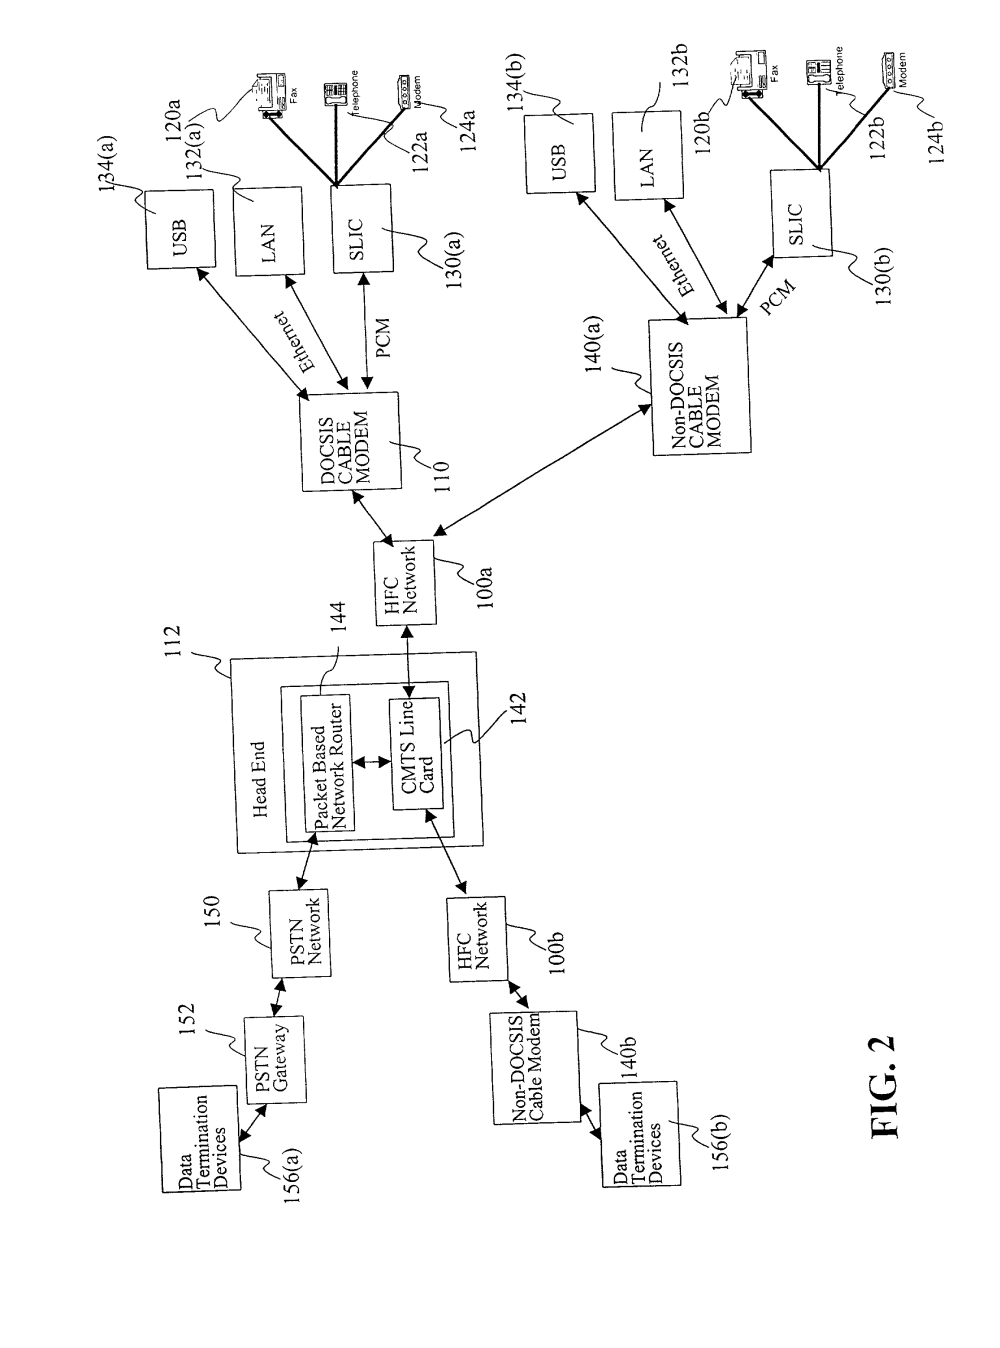 medium resolution of isb after treatment wiring diagram online wiring diagram basic light wiring diagrams isb 300 pcm wiring